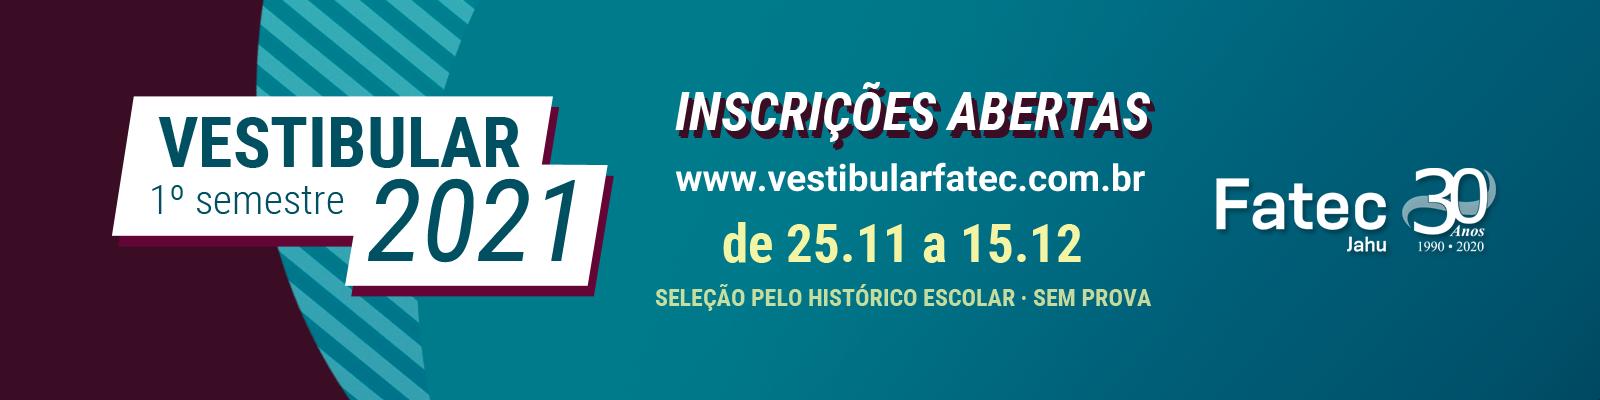 banner_vestibular21-1